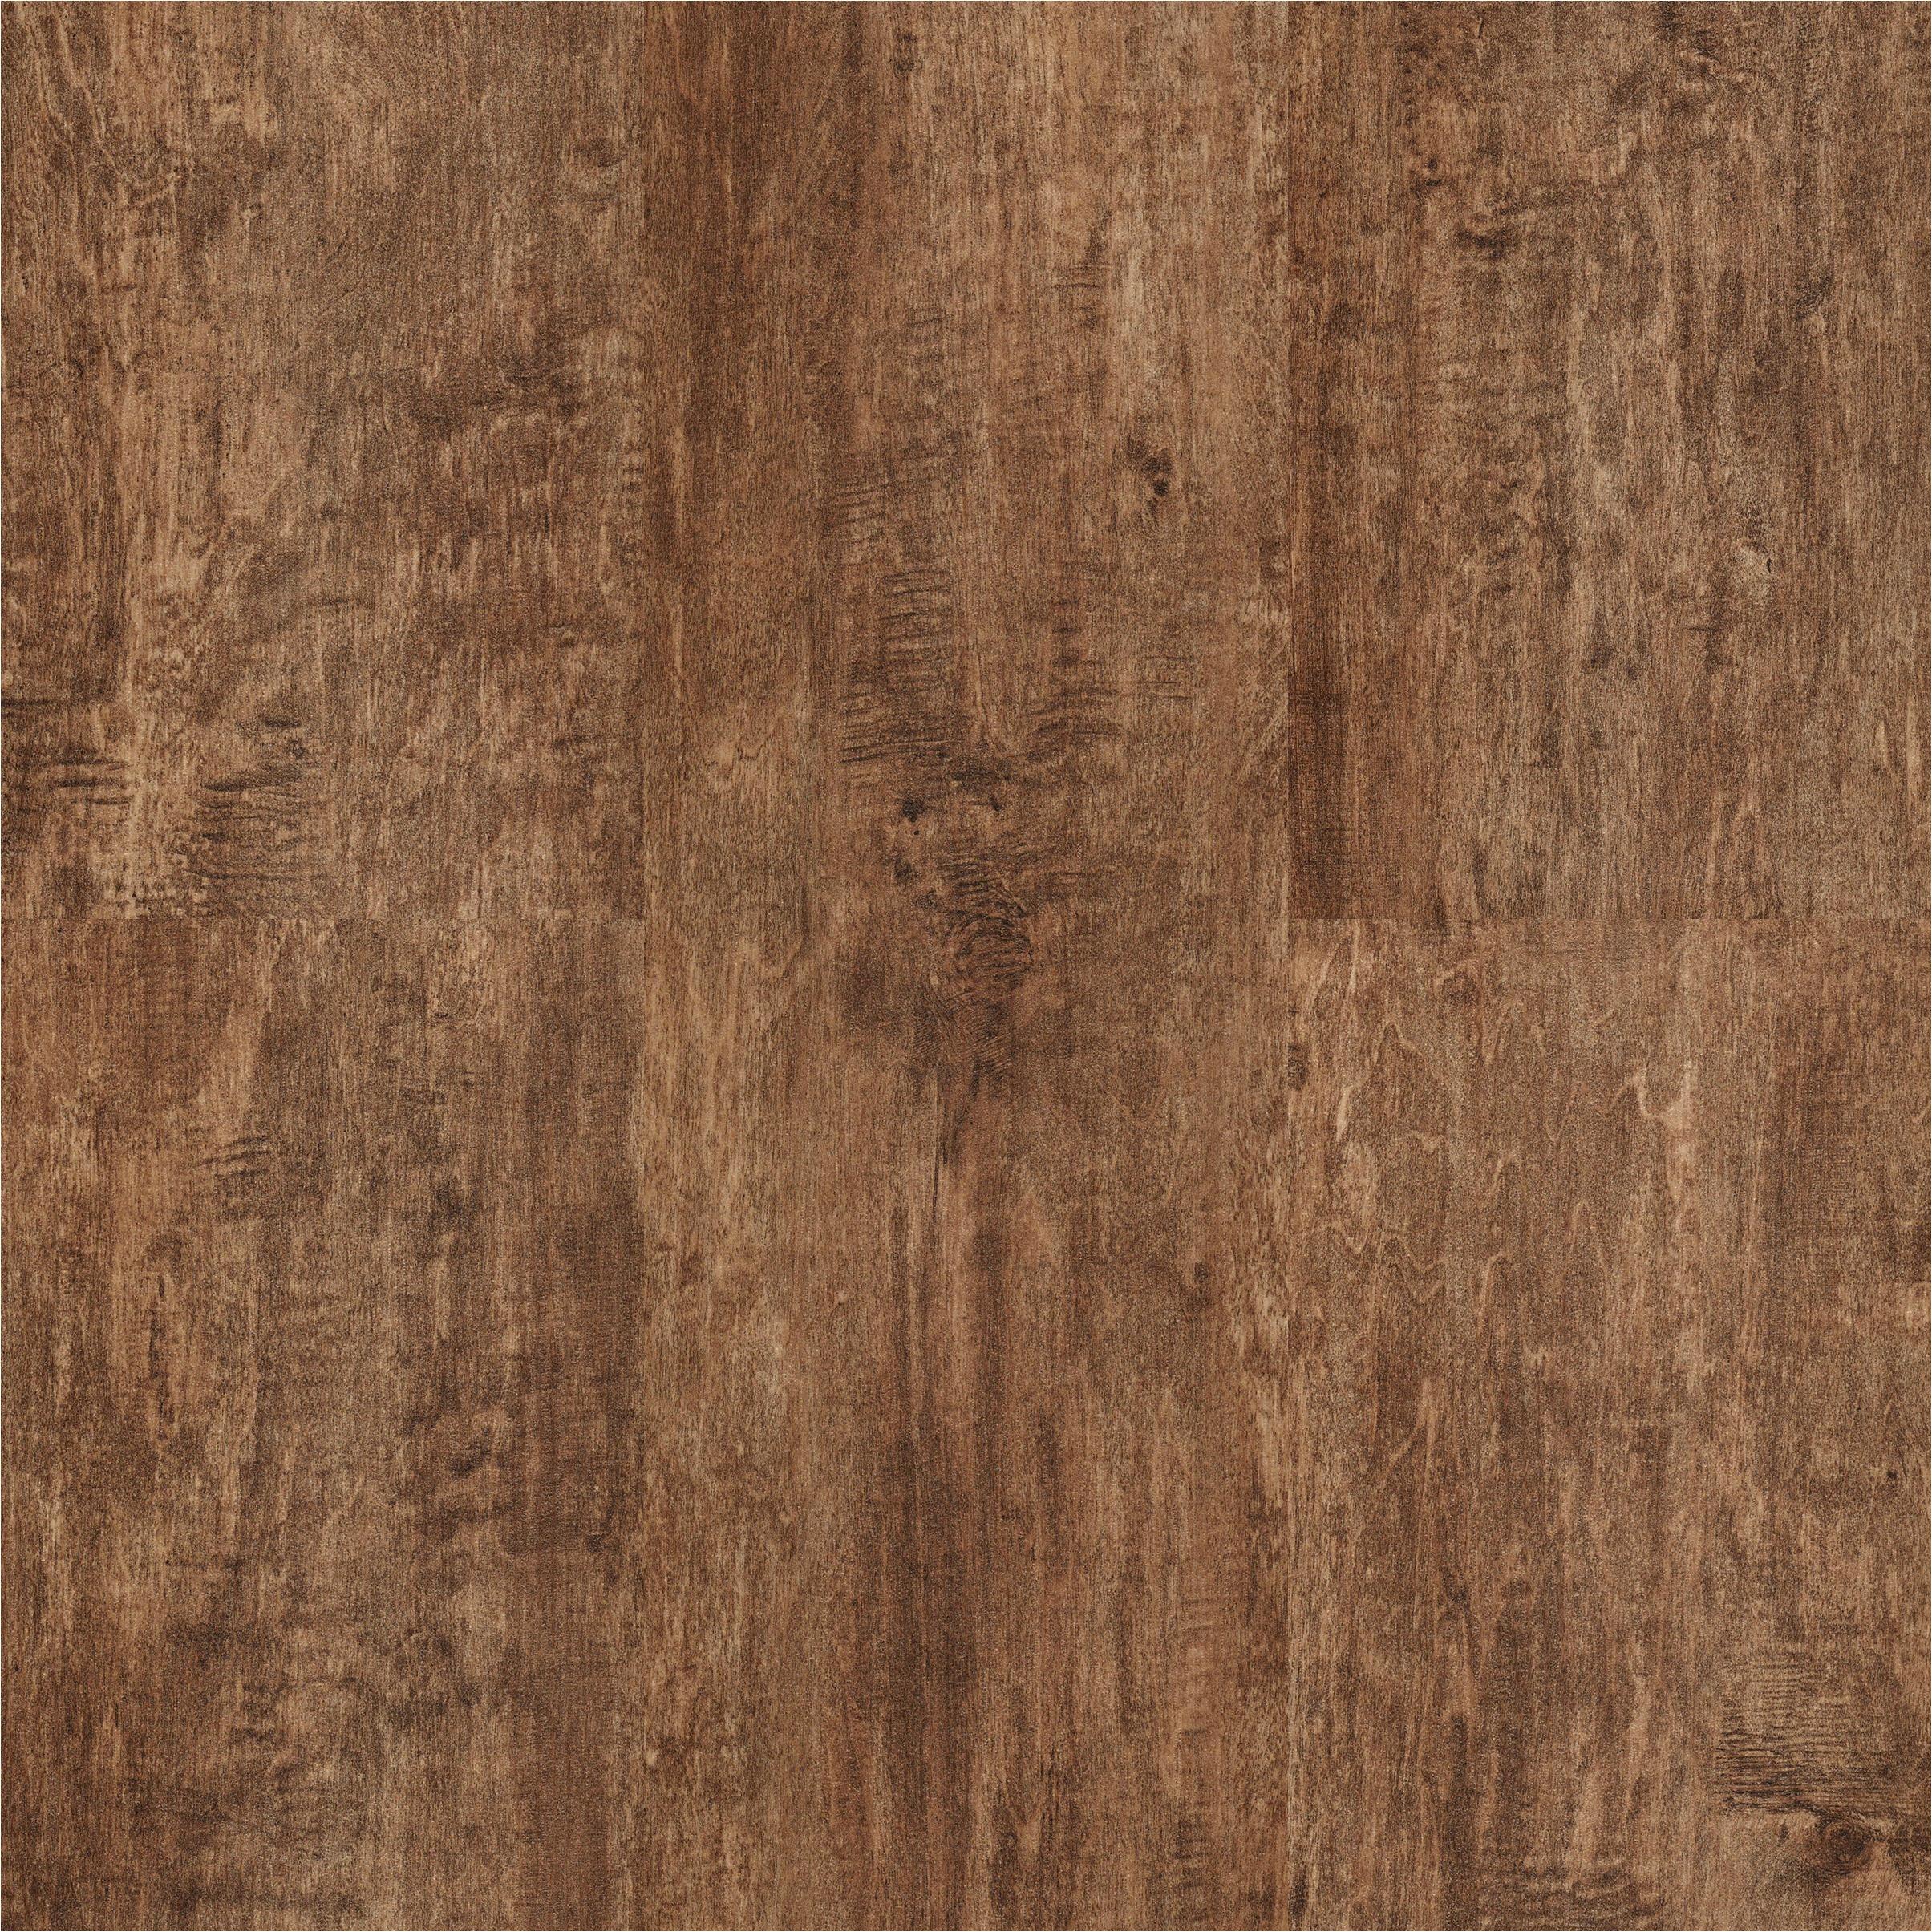 Premier Glueless Laminate Flooring 7mm Premier Glueless Laminate Flooring Light Maple